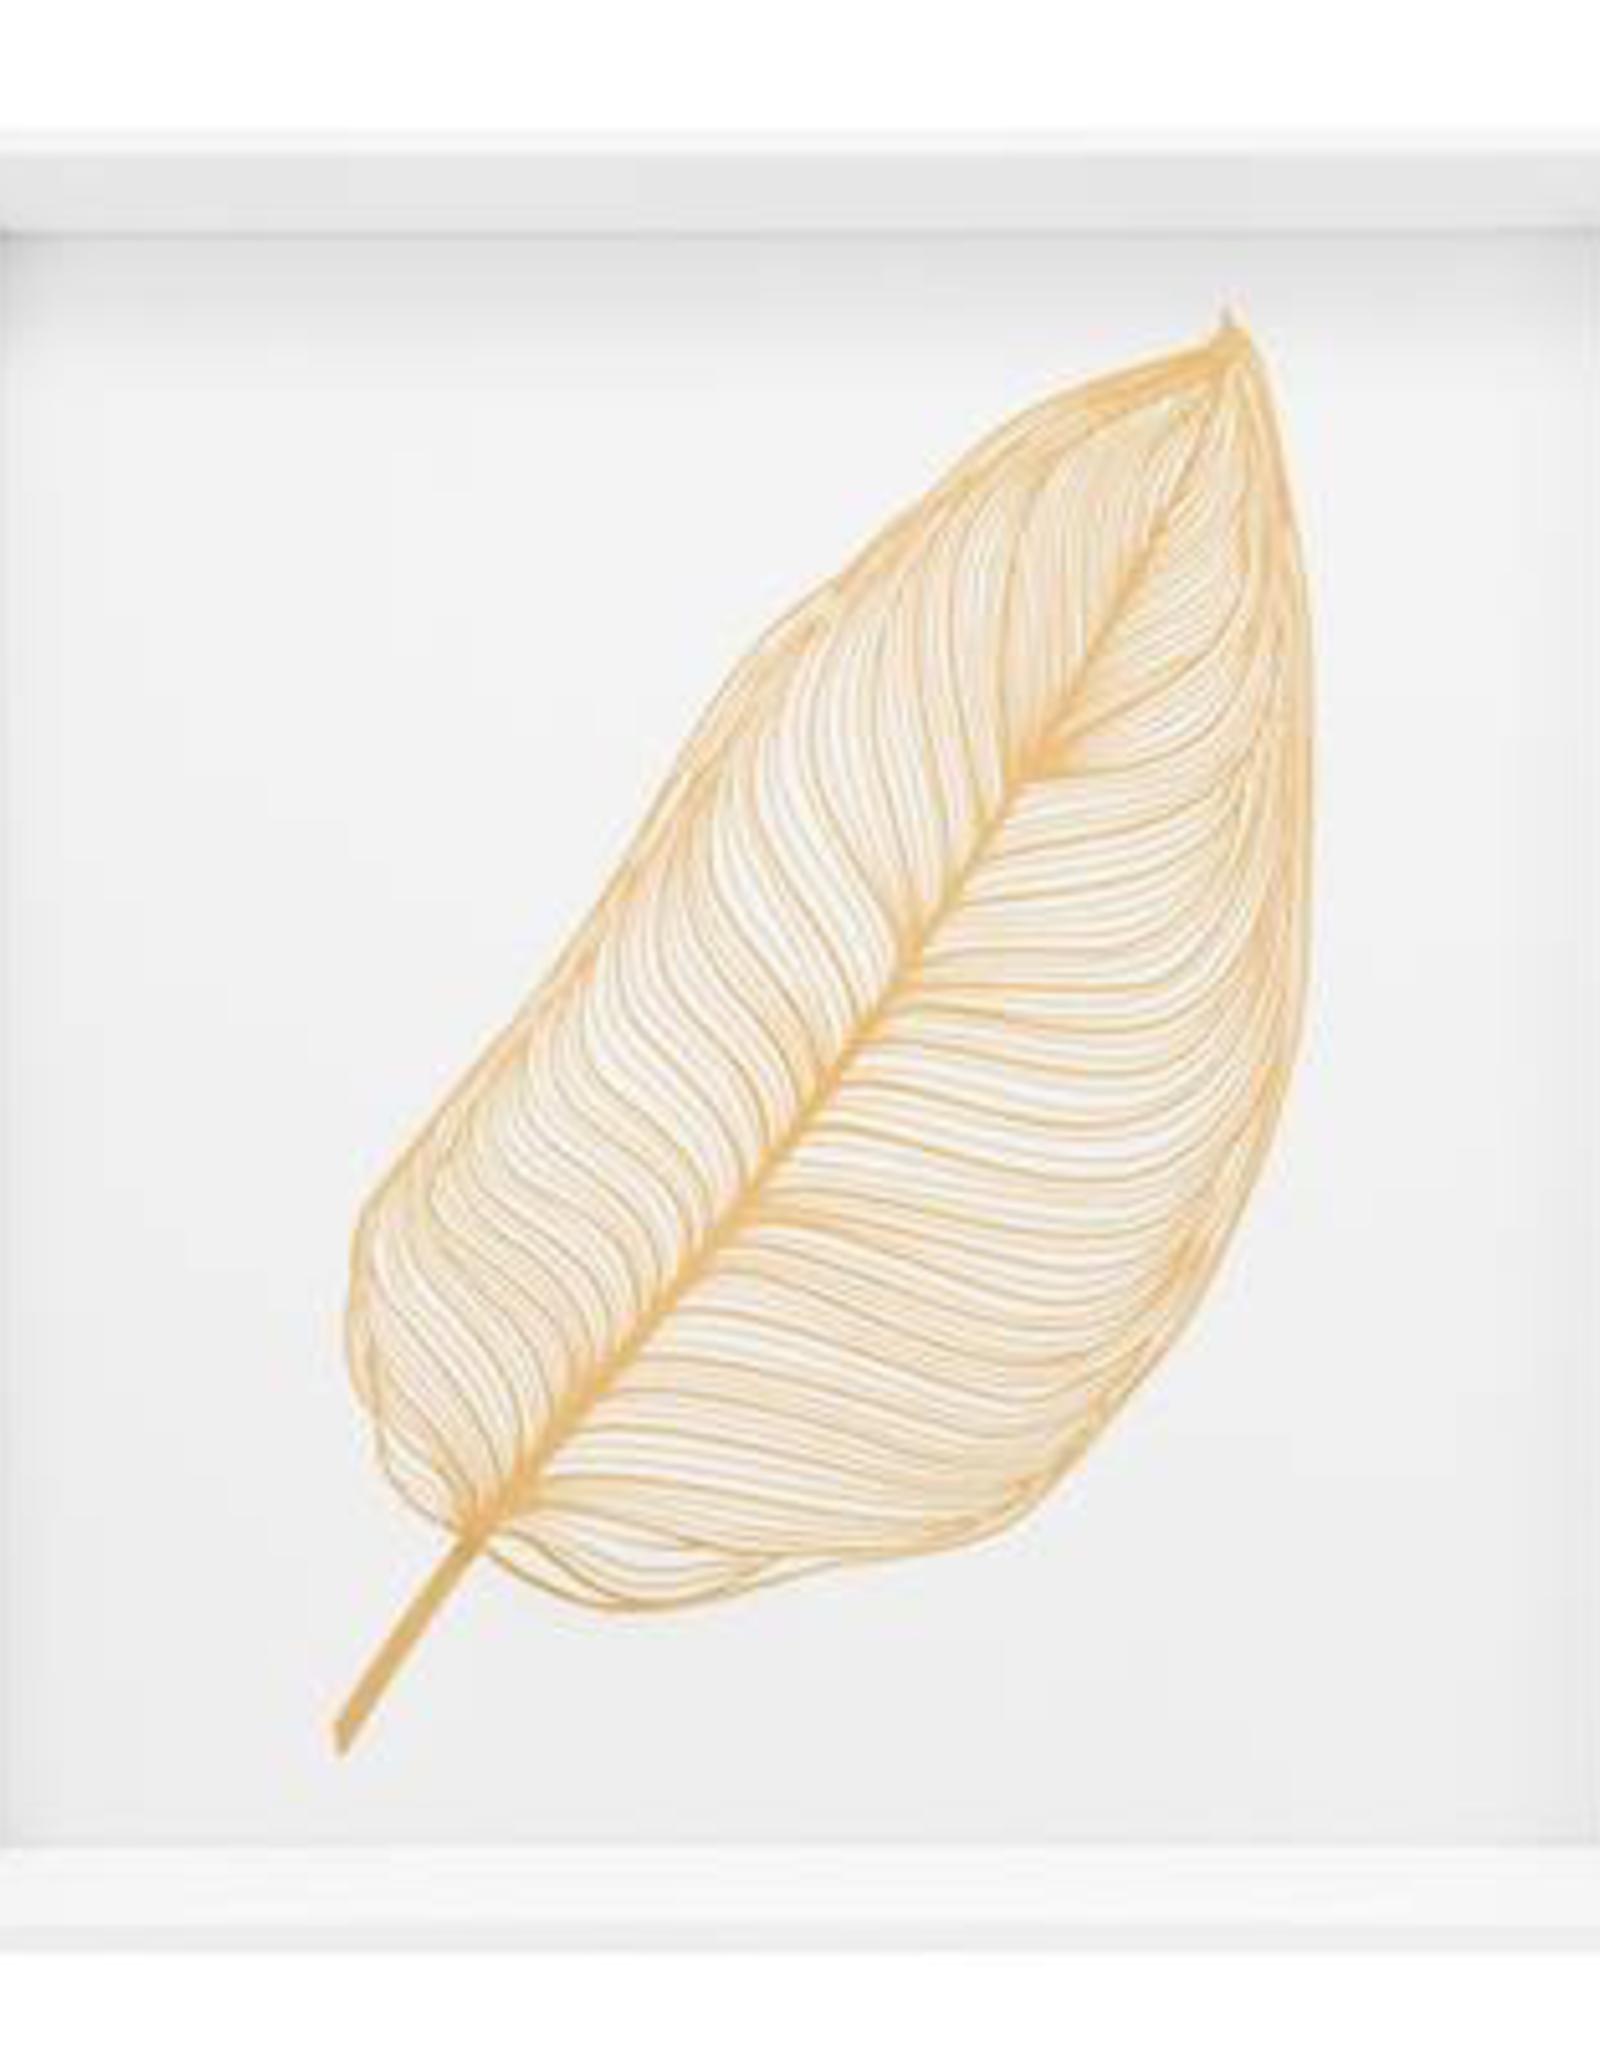 "Print, Canvas, Gold Banana Leaf, 17"" Square"